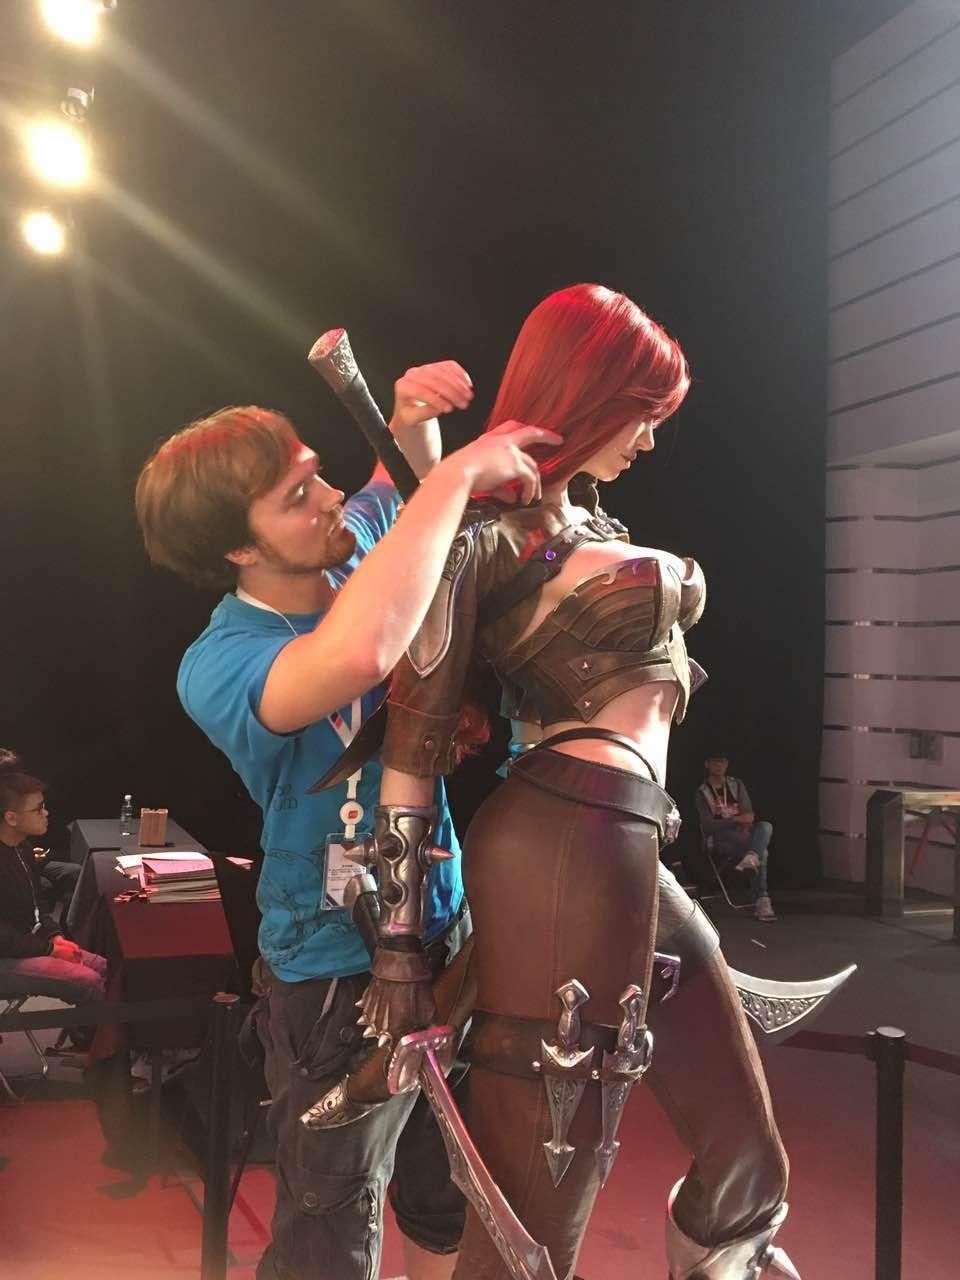 Fixing Katarina's hair for her big debut